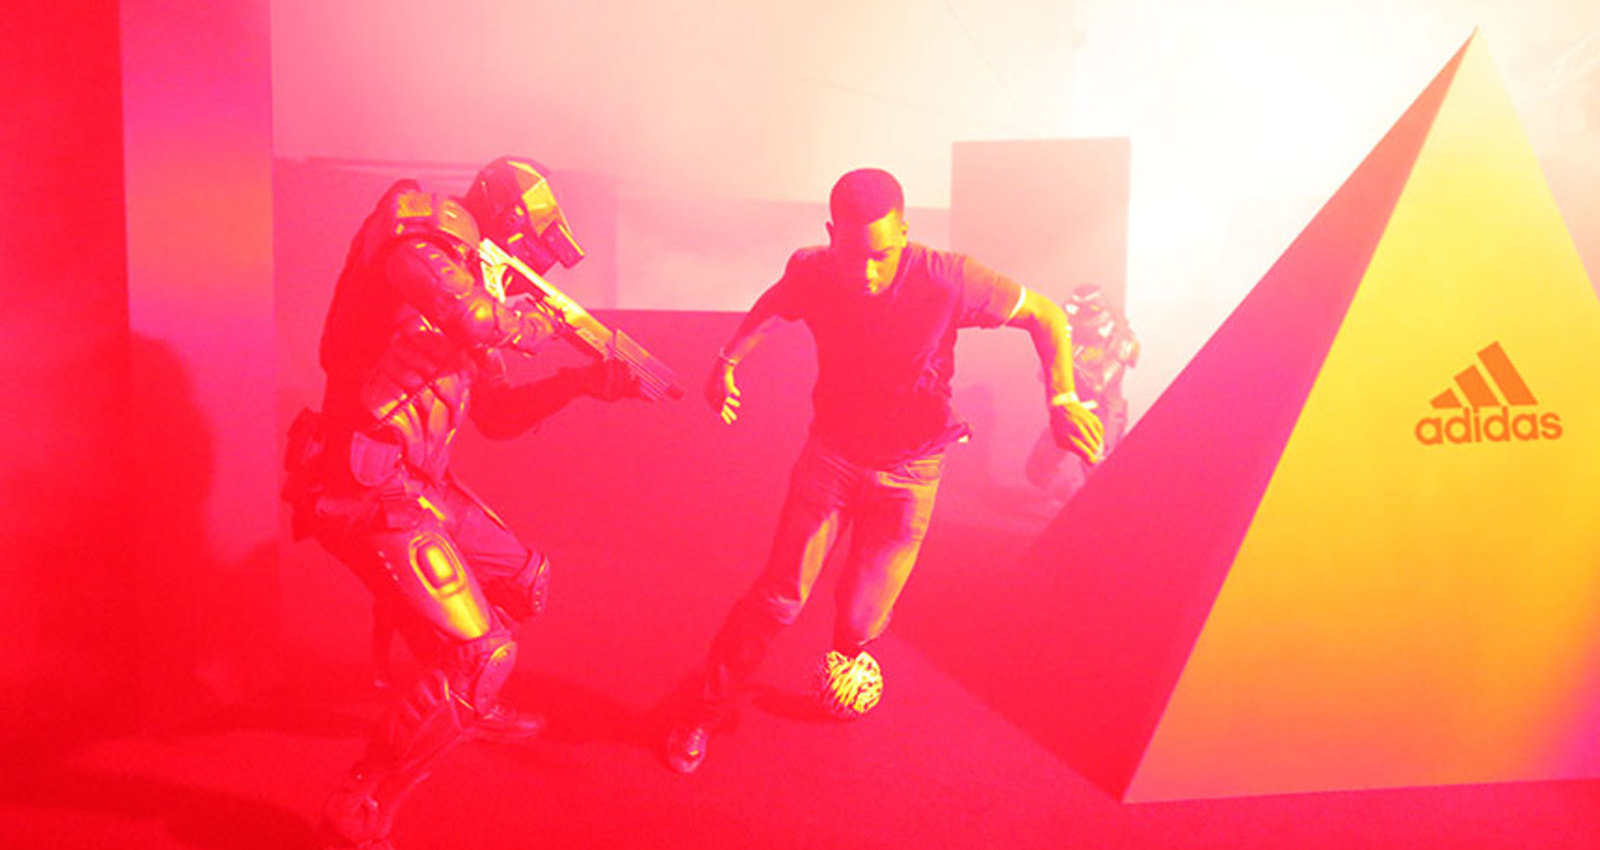 Predator Instinct: The Game